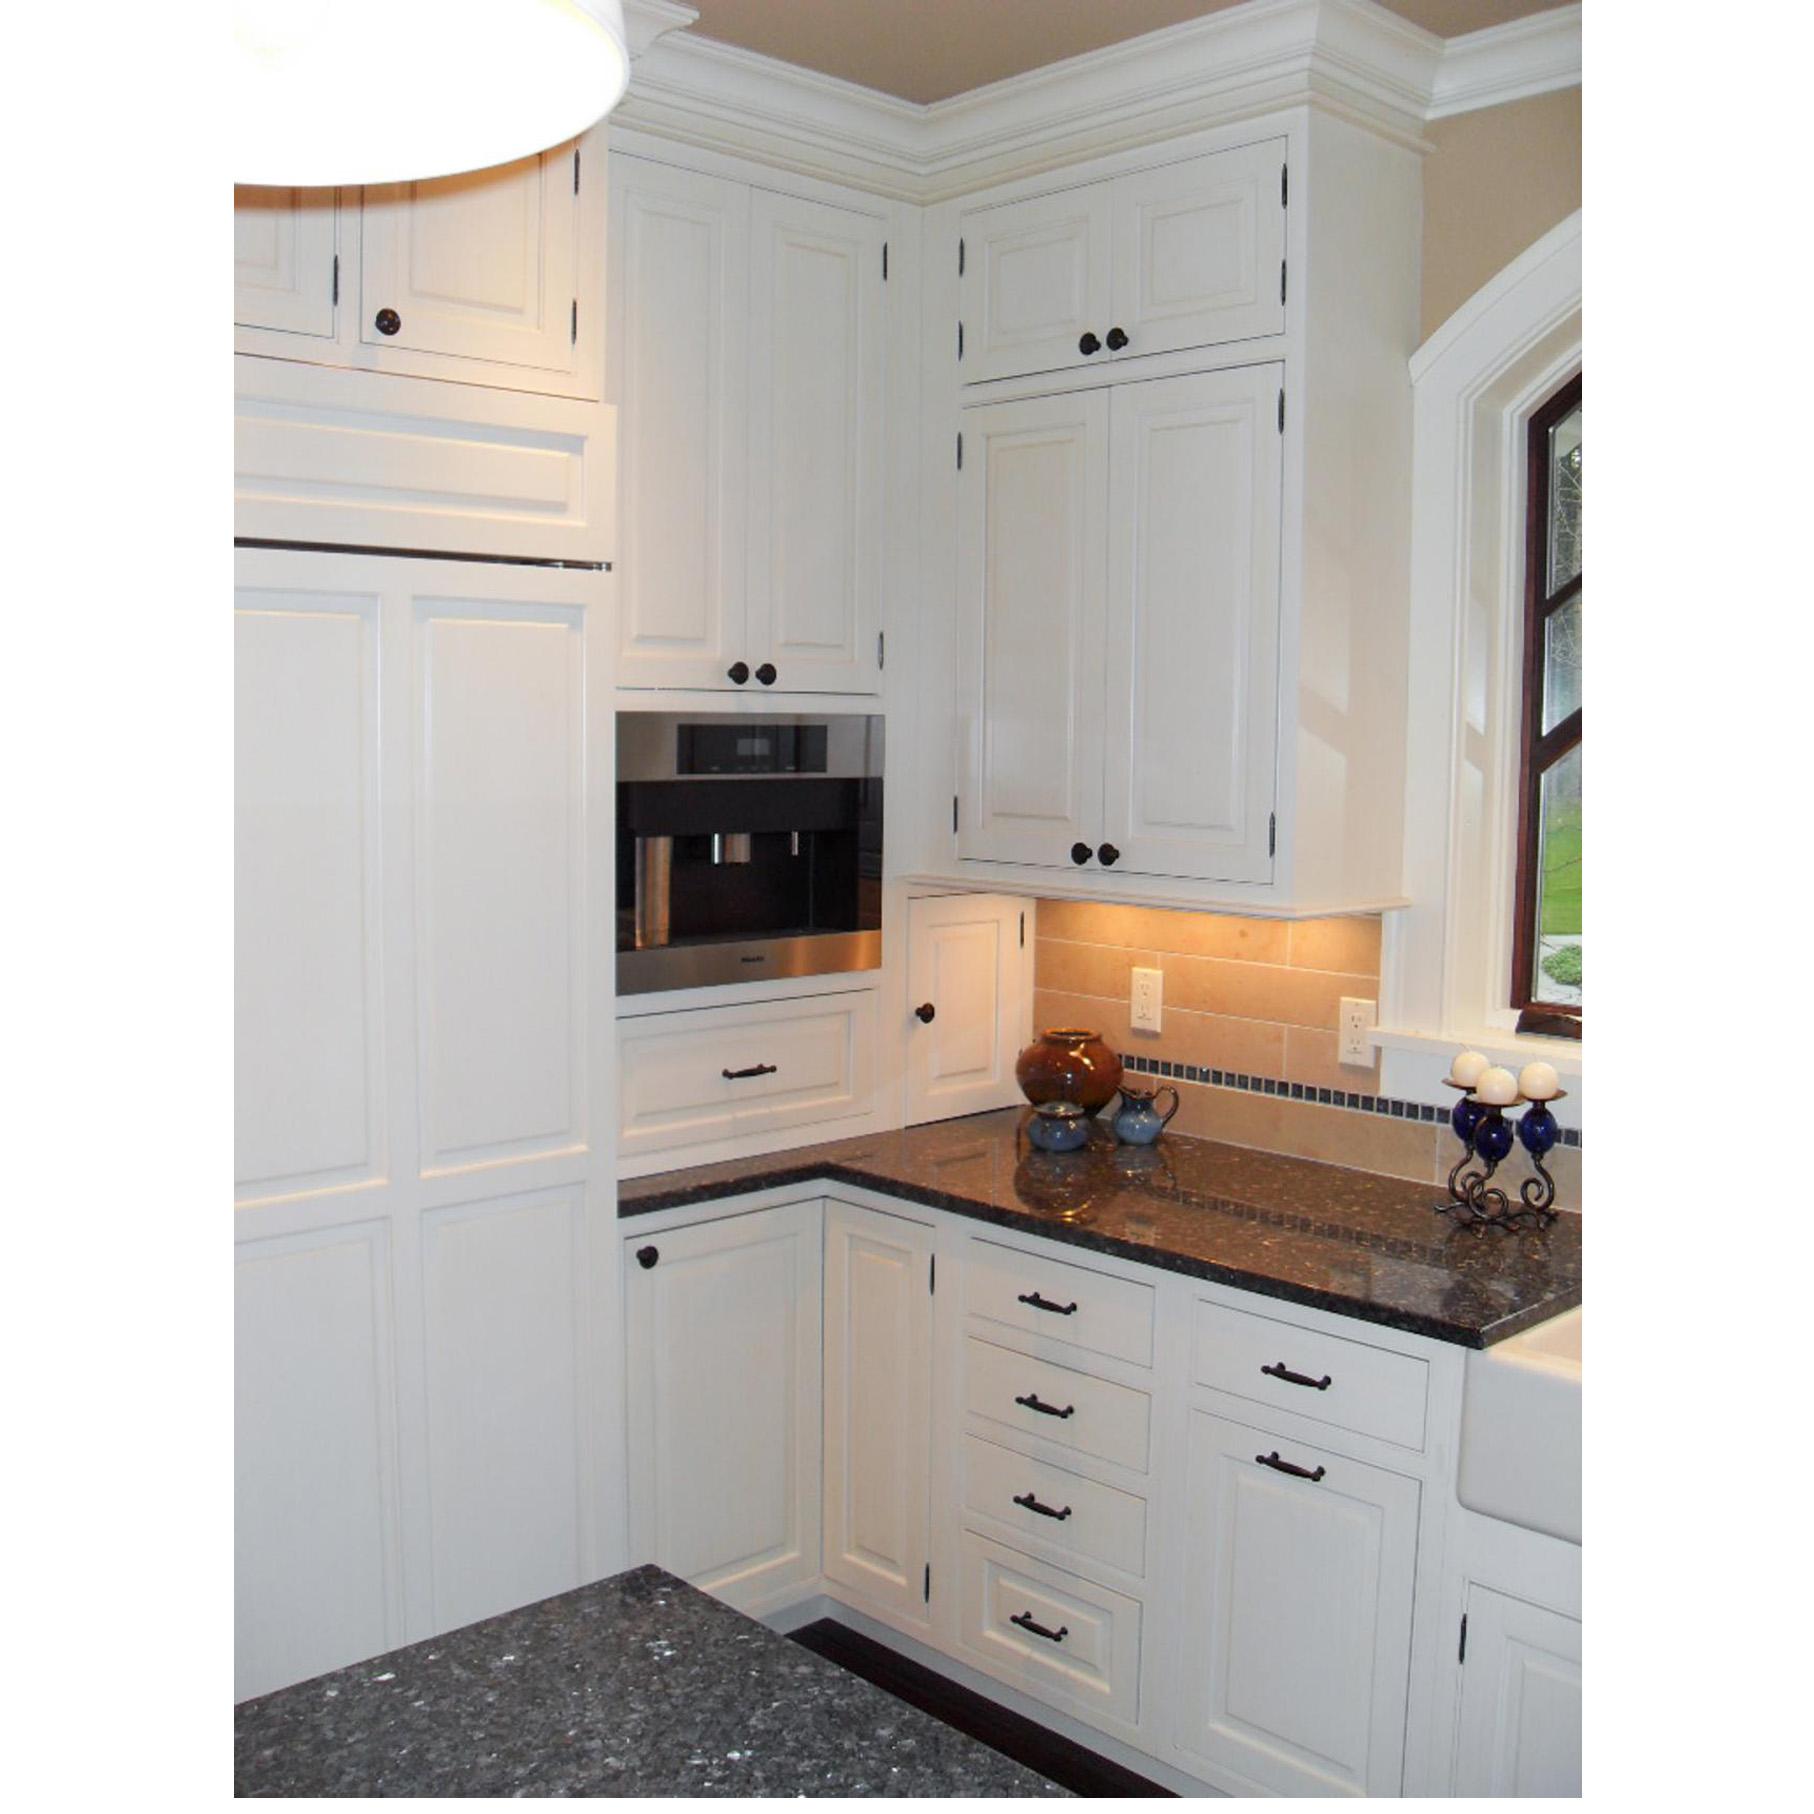 luxury cheap fitted kitchens built in microwave standard kitchen storage full kitchen cabinet buy kitchen cabinet modern luxury kitchen